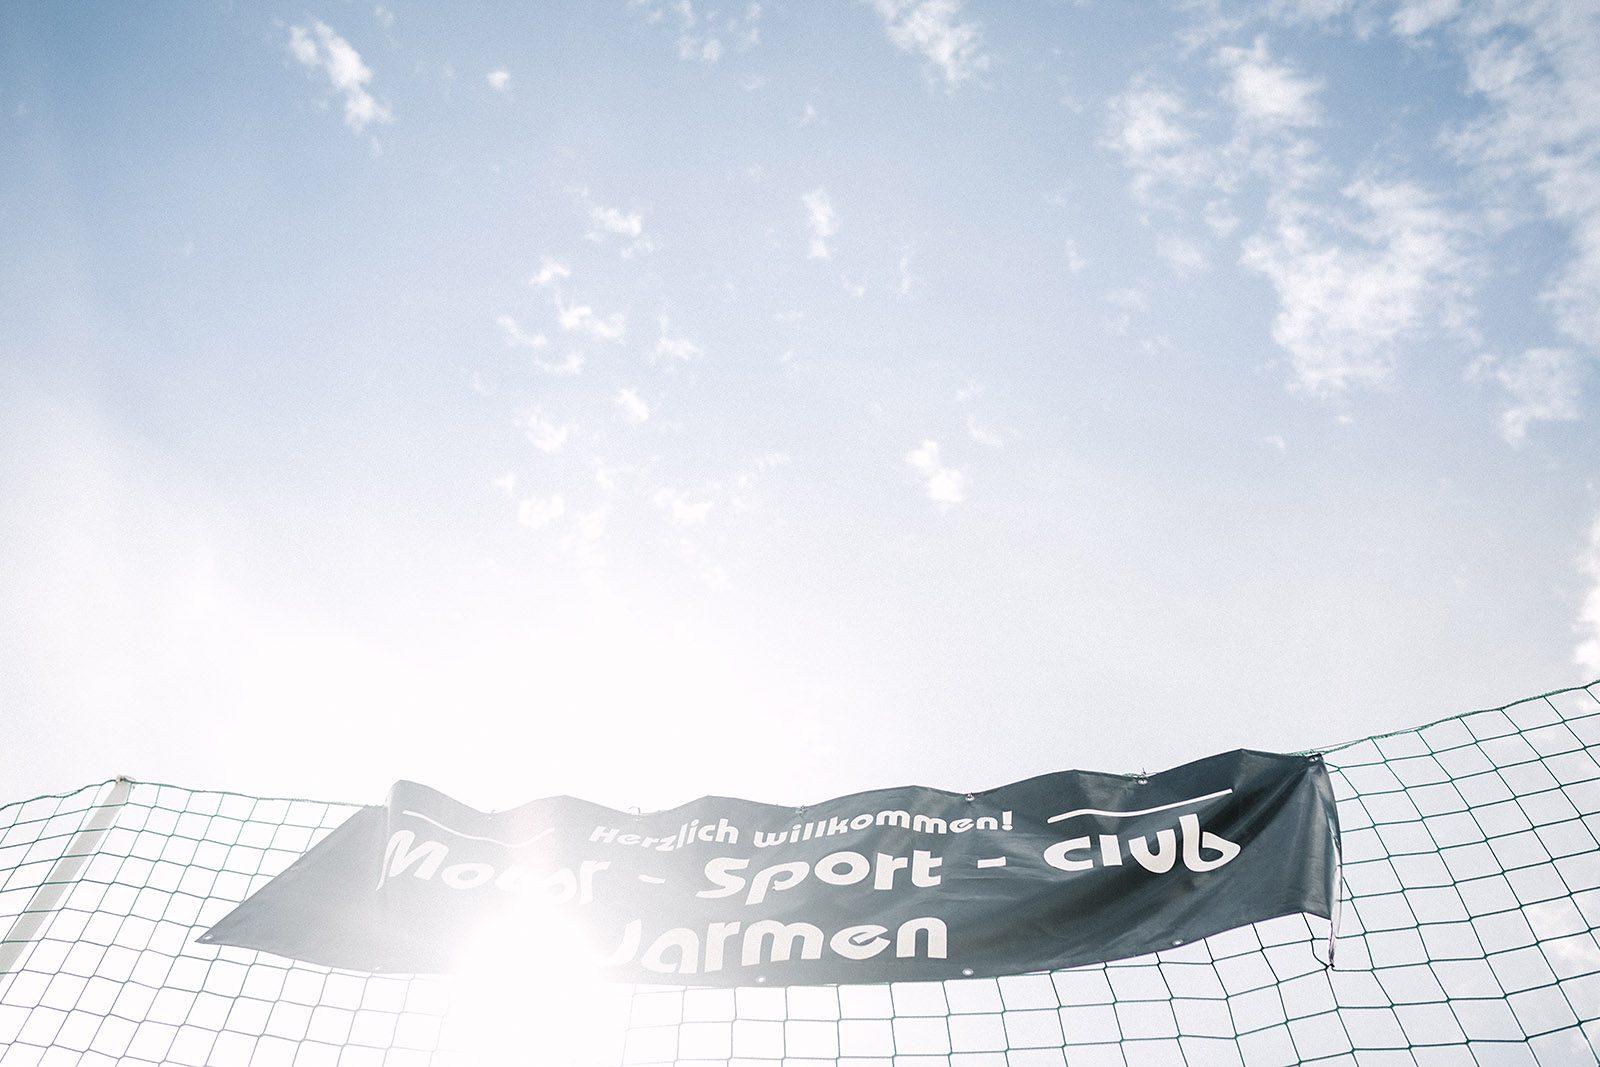 Motor Sport Club Jarmen